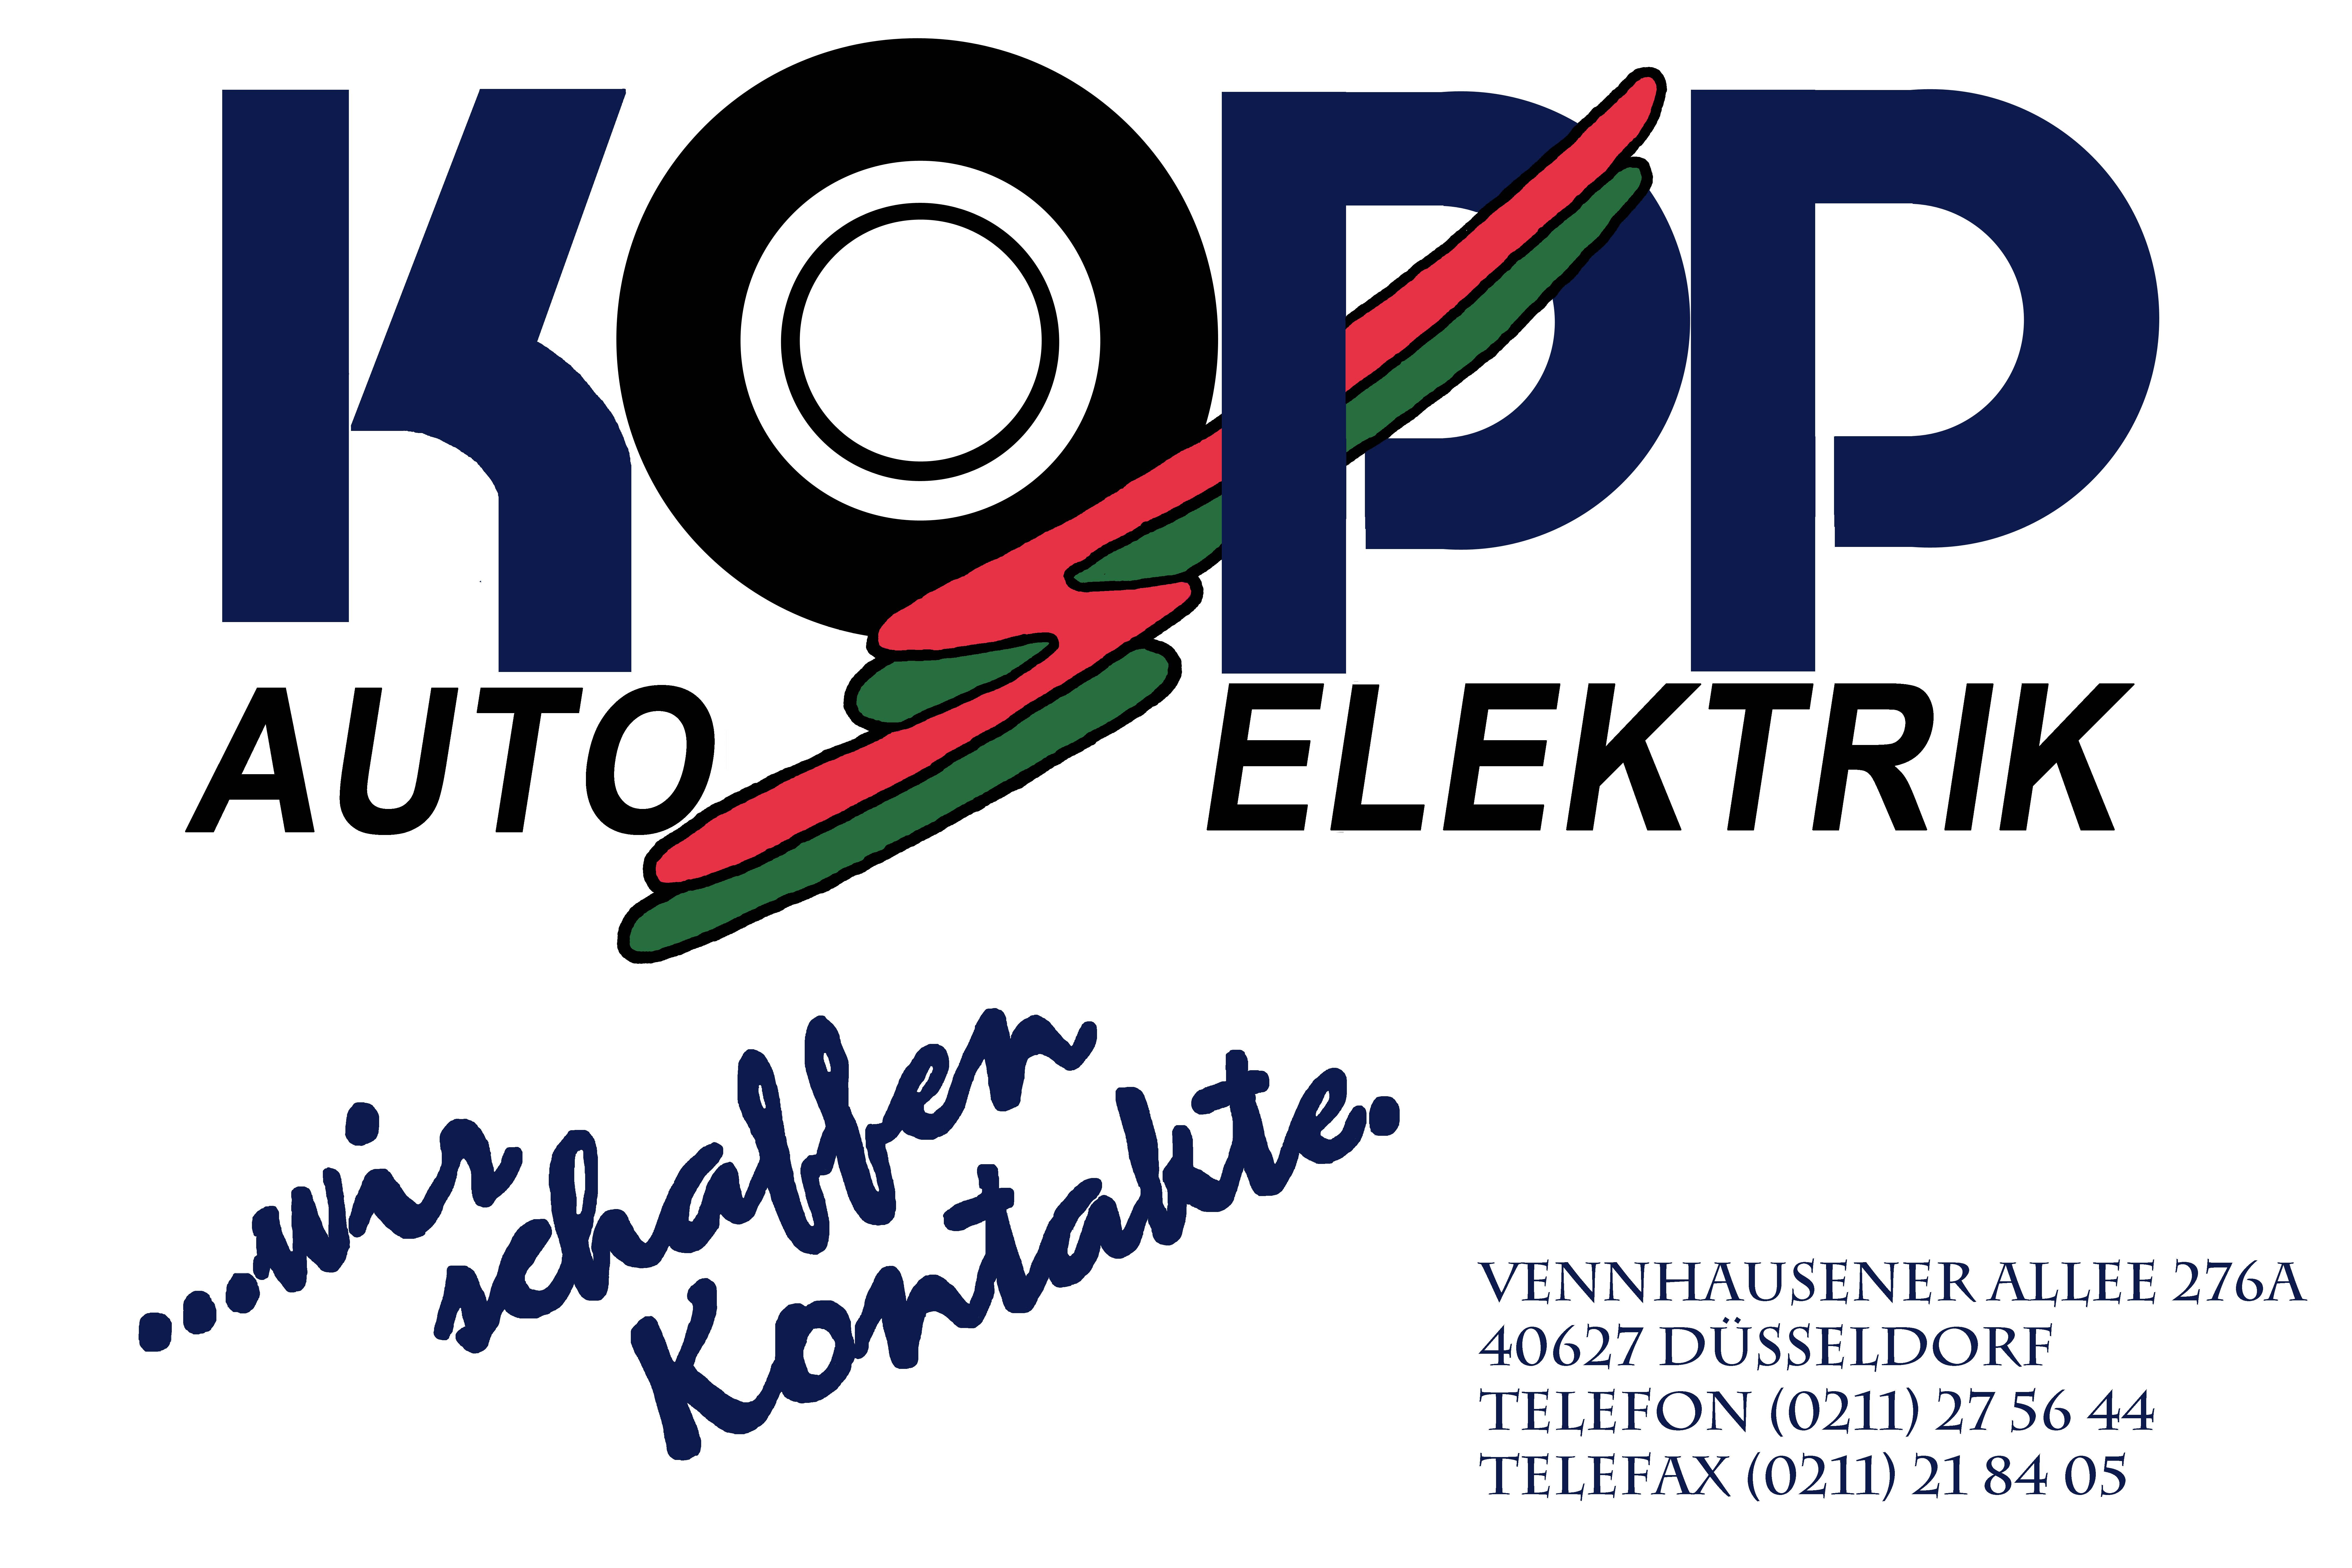 Autoelektrik Willi Kopp GmbH